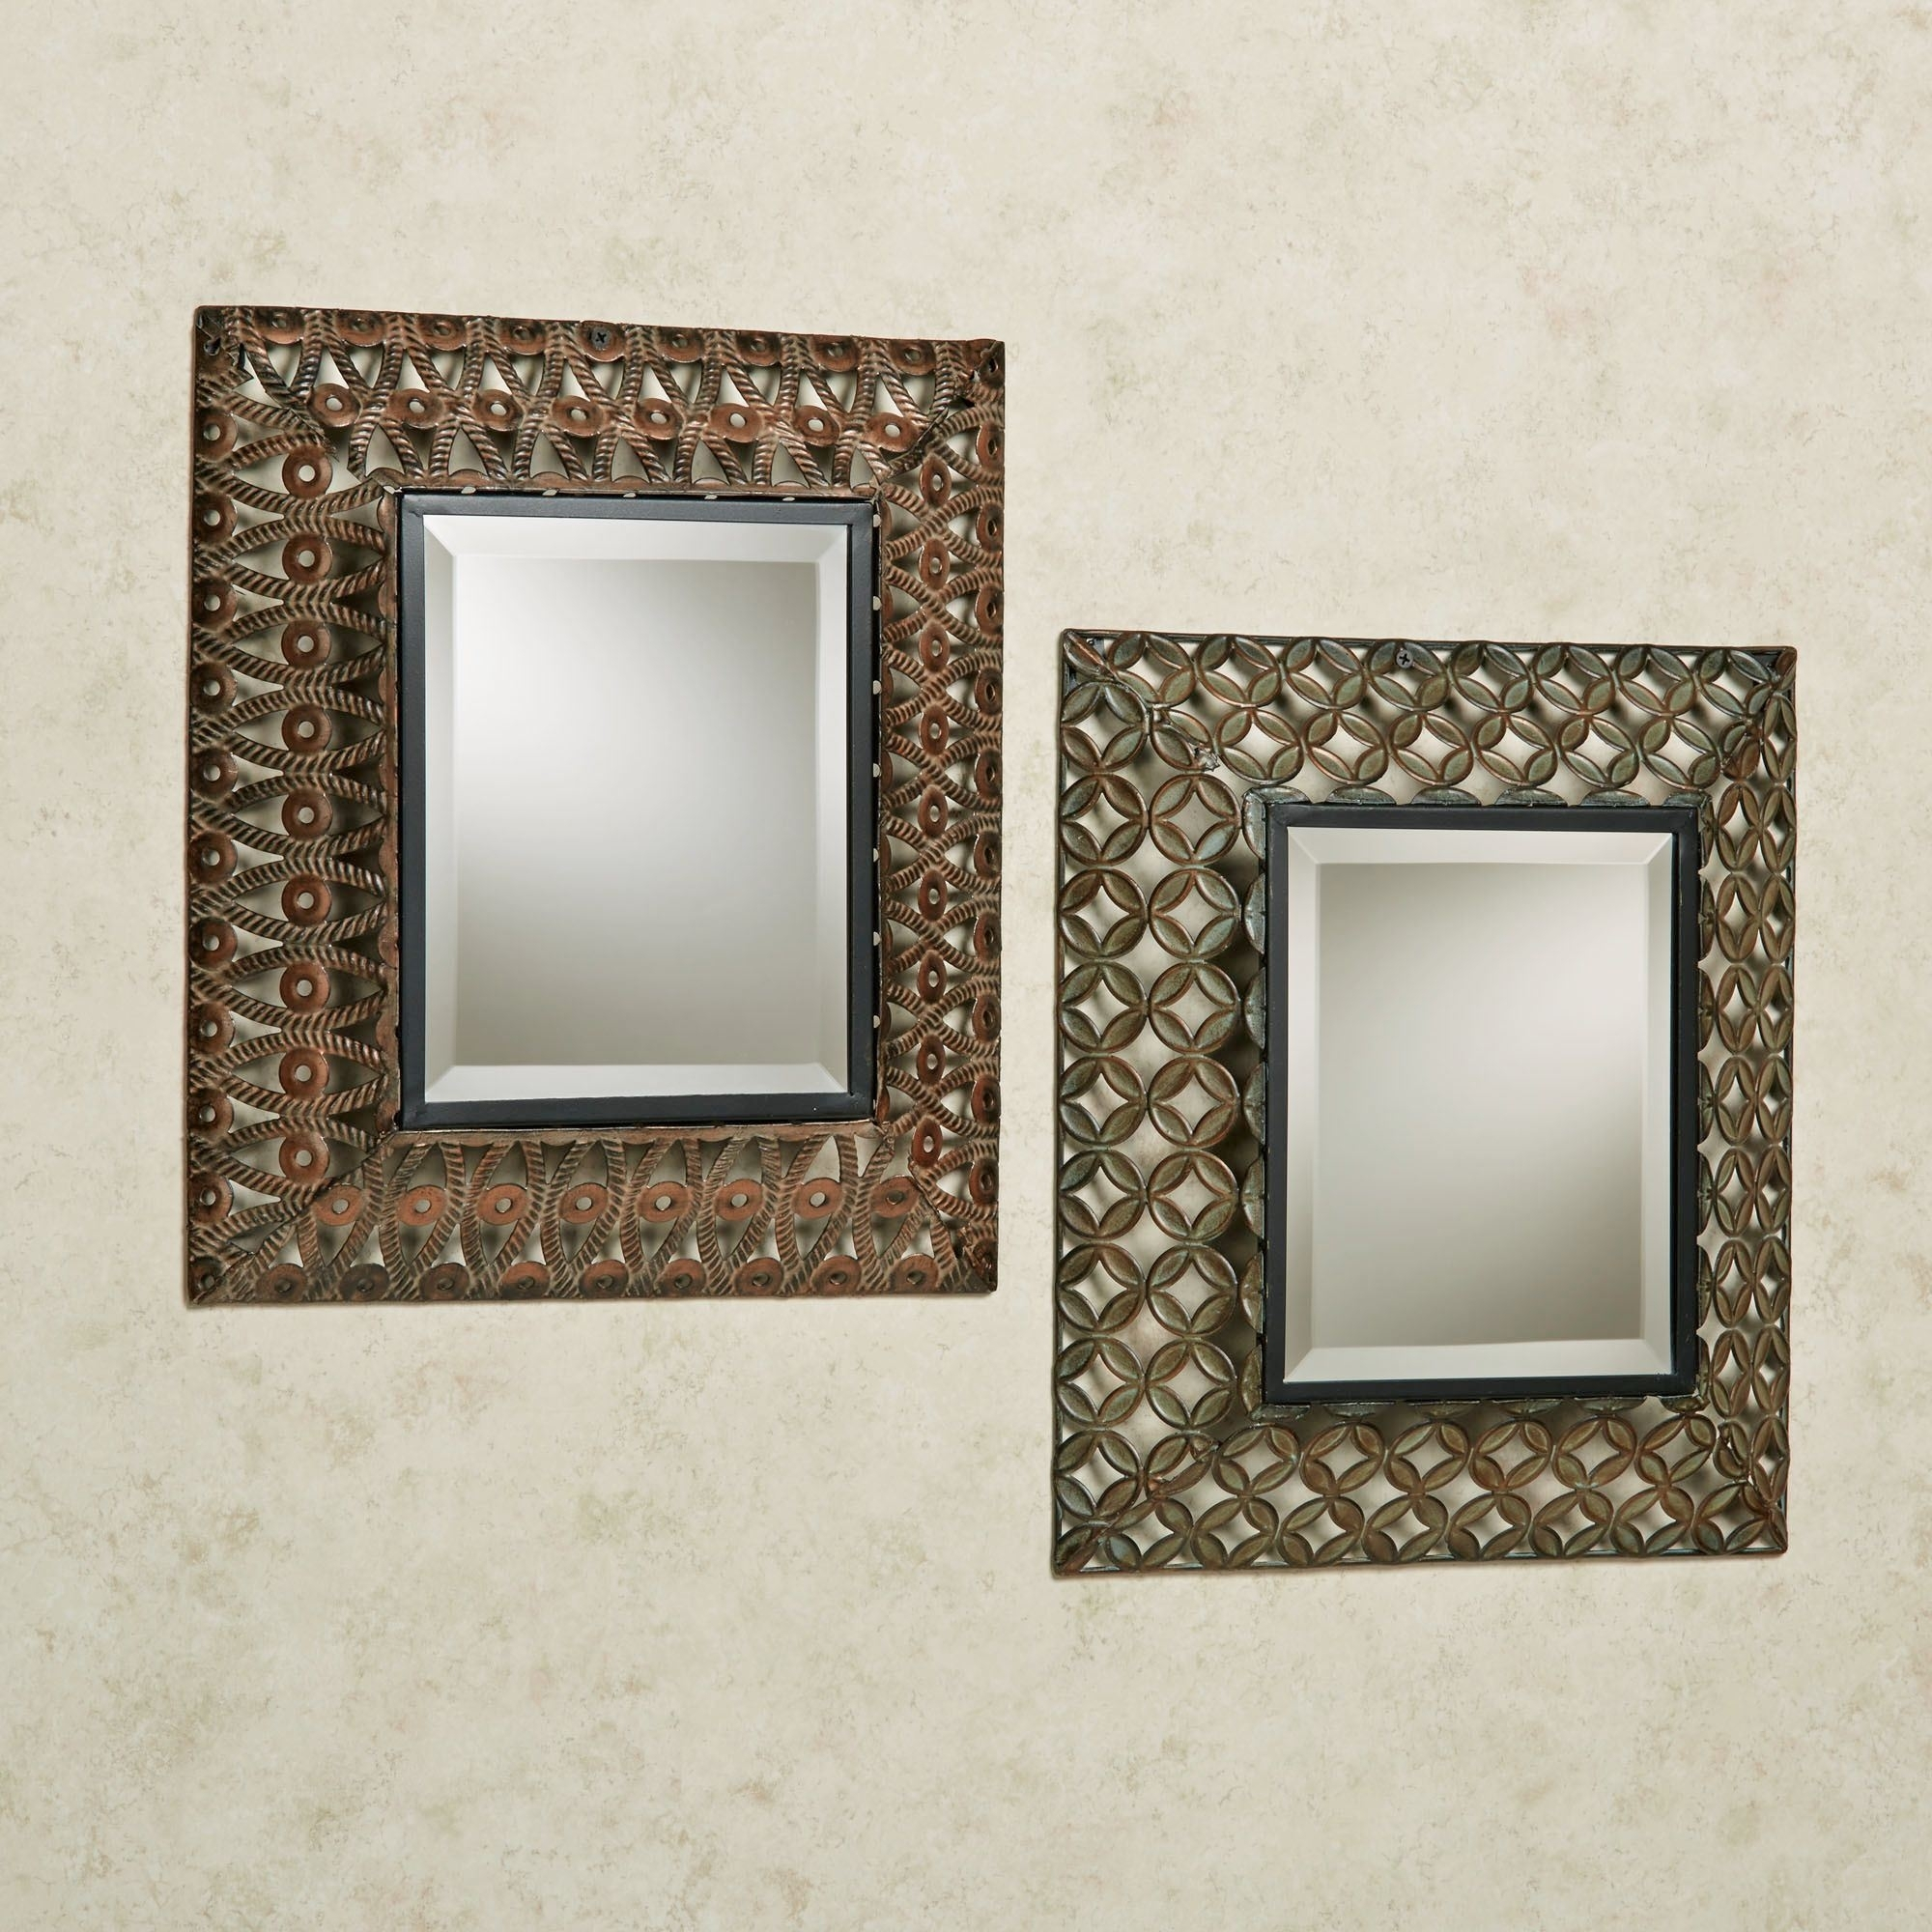 Cheap Decorative Wall Mirror Vintage Mirror Sets Wall Decor – Wall In Recent Mirror Sets Wall Accents (Gallery 3 of 15)